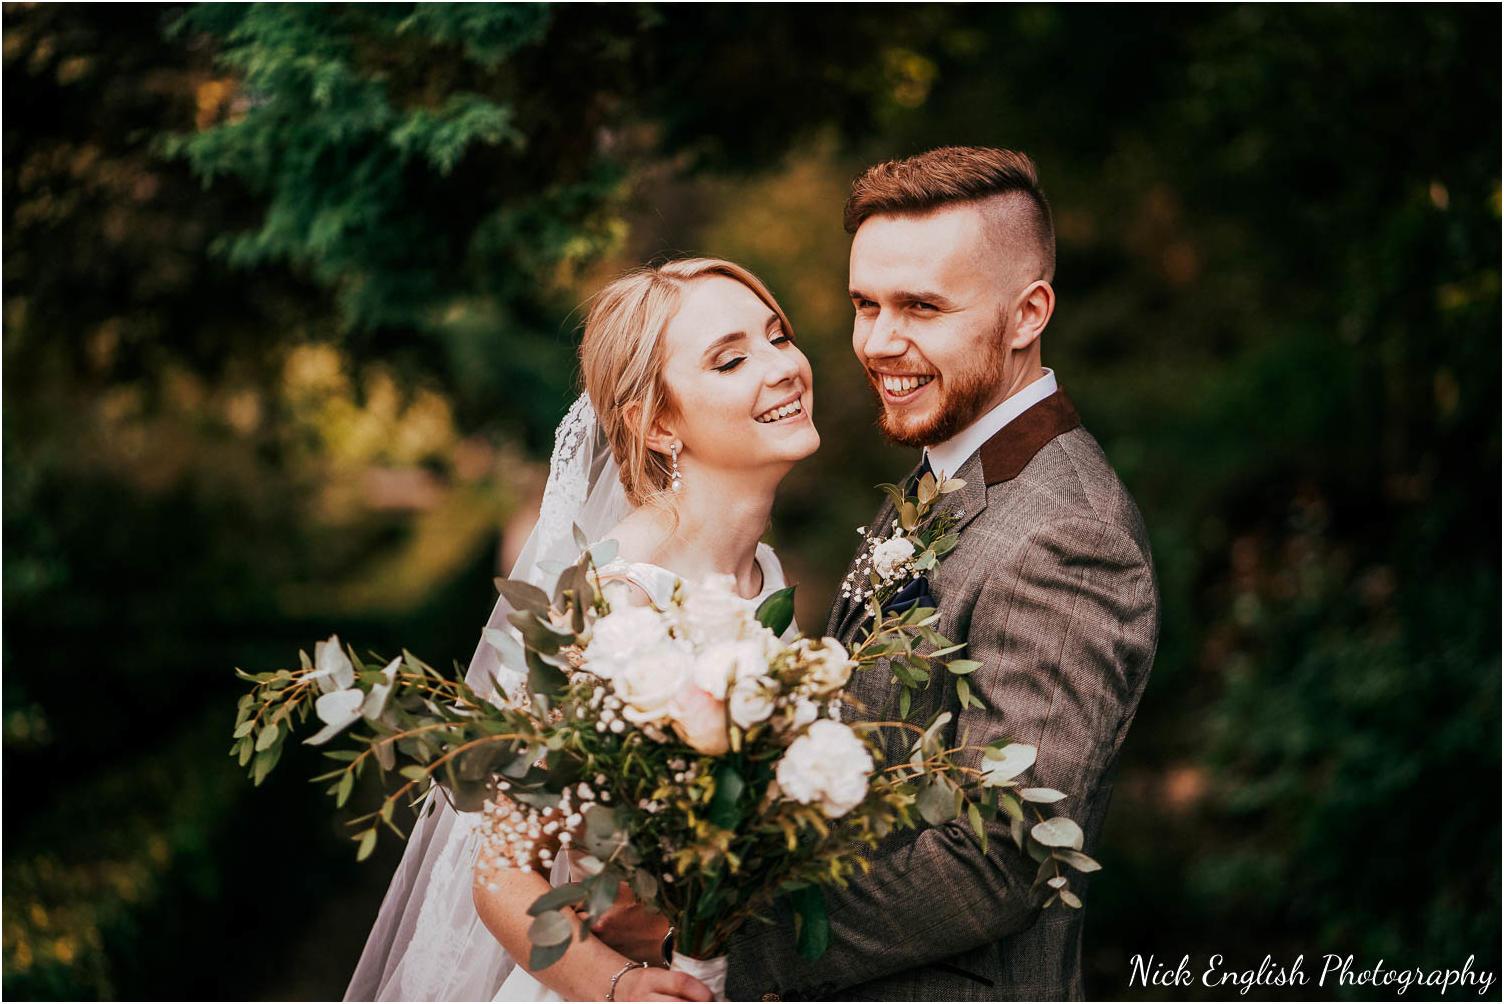 Eaves_Hall_Outdoor_Wedding_Photograph-55.jpg